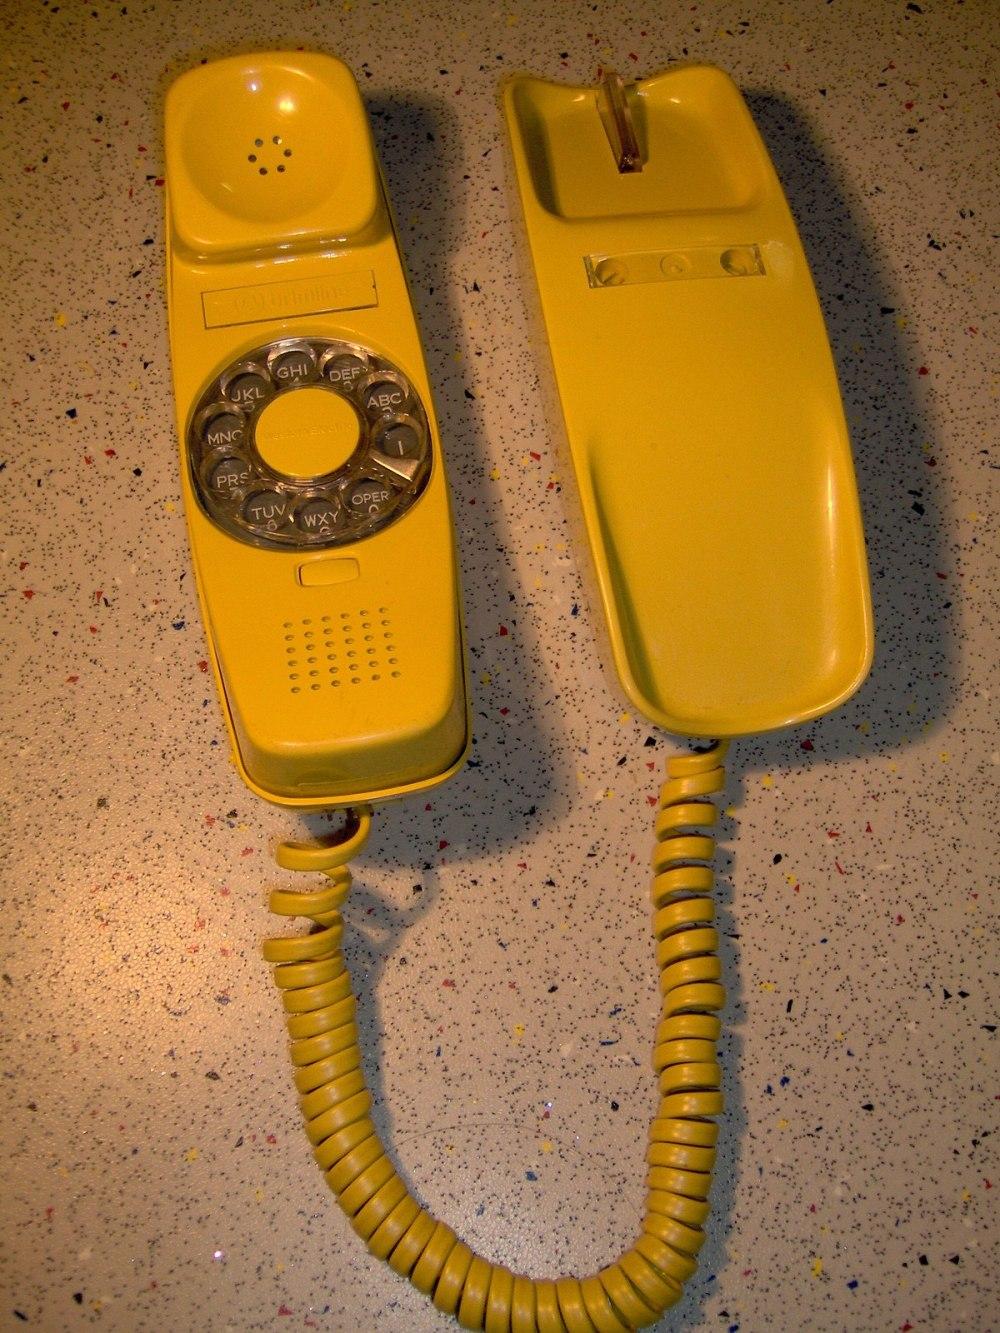 medium resolution of dial phone wiring diagram